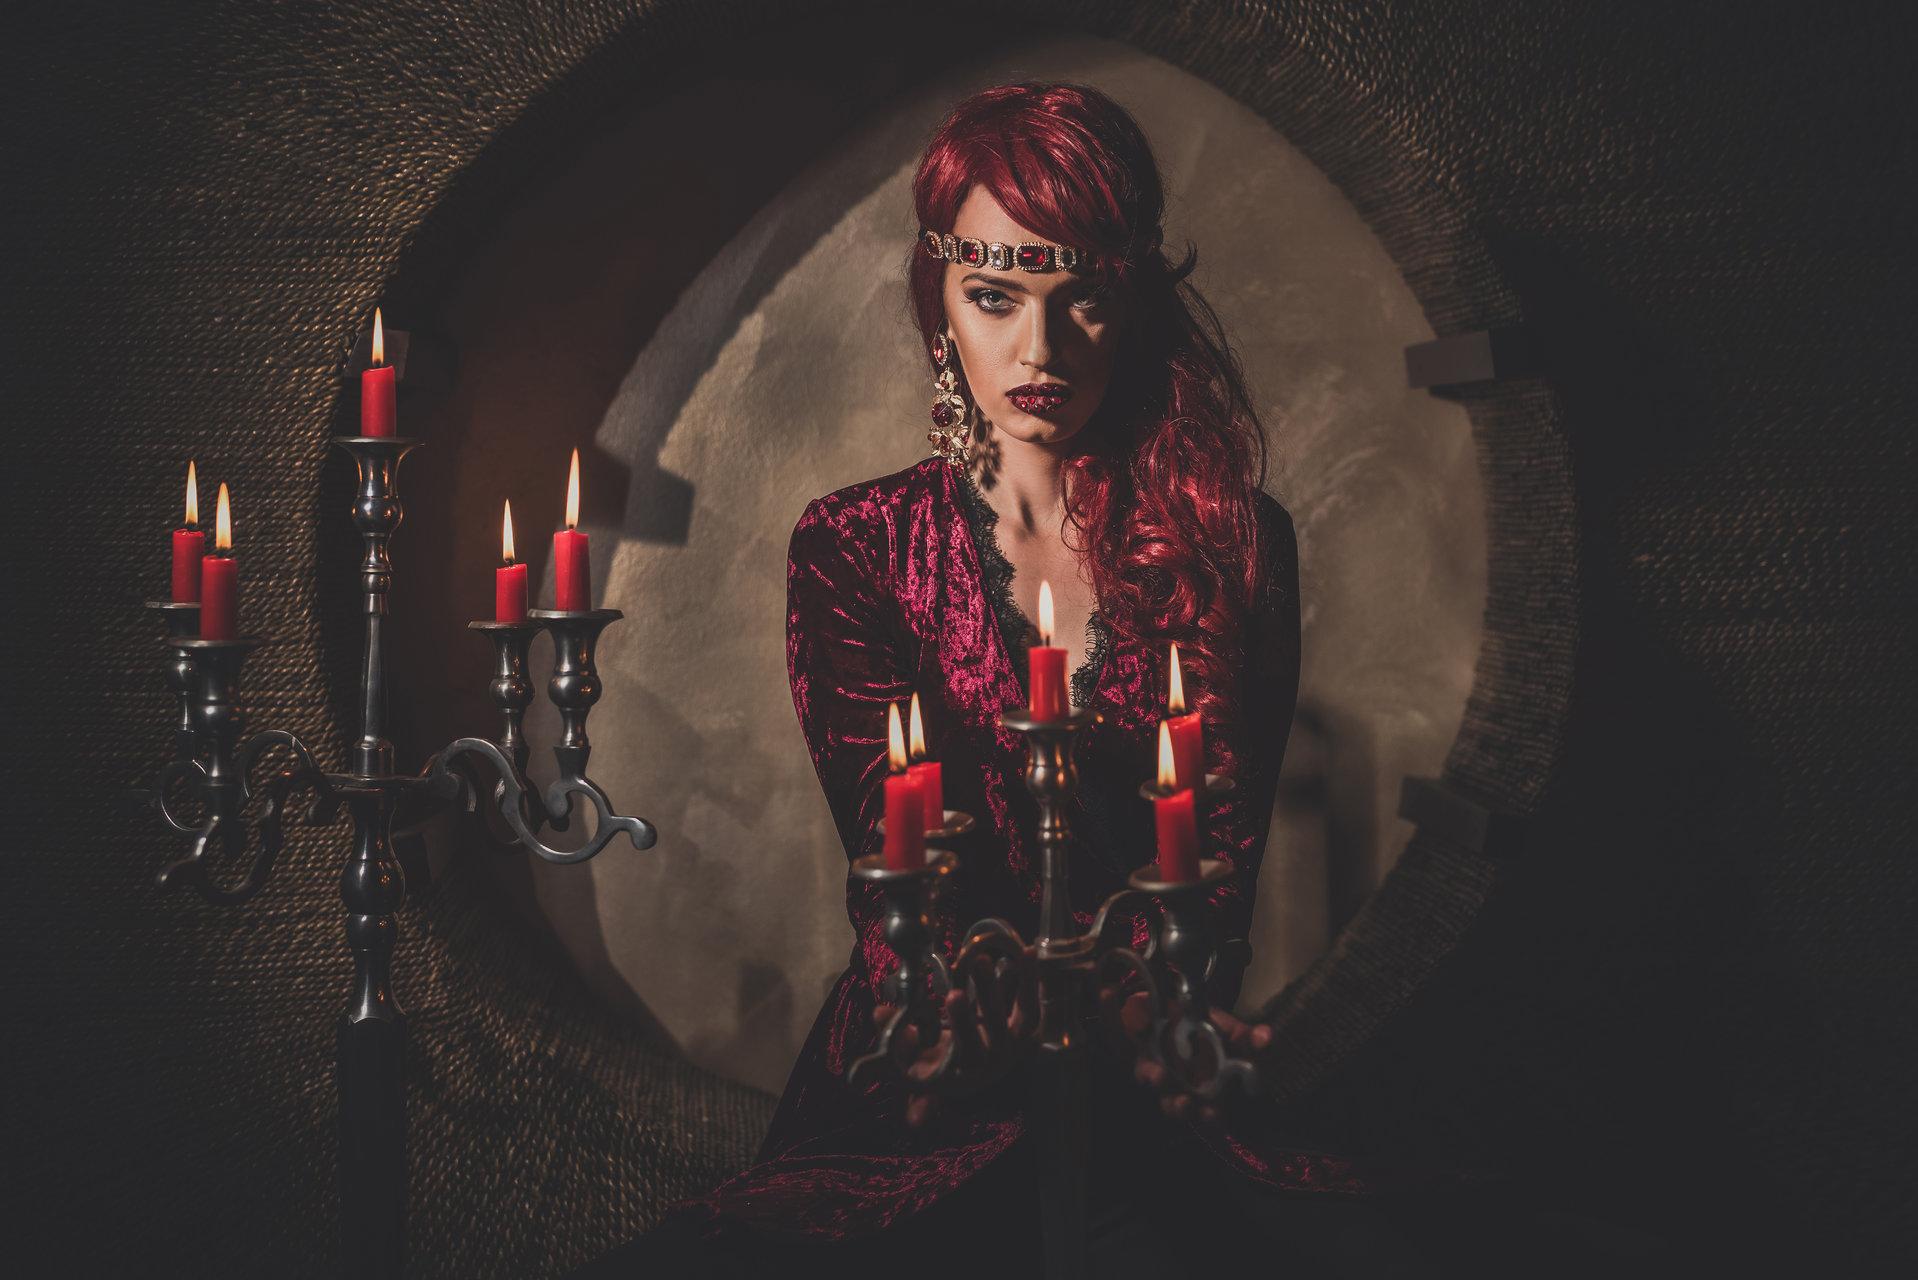 Red Queen | Author AJPetkov | PHOTO FORUM